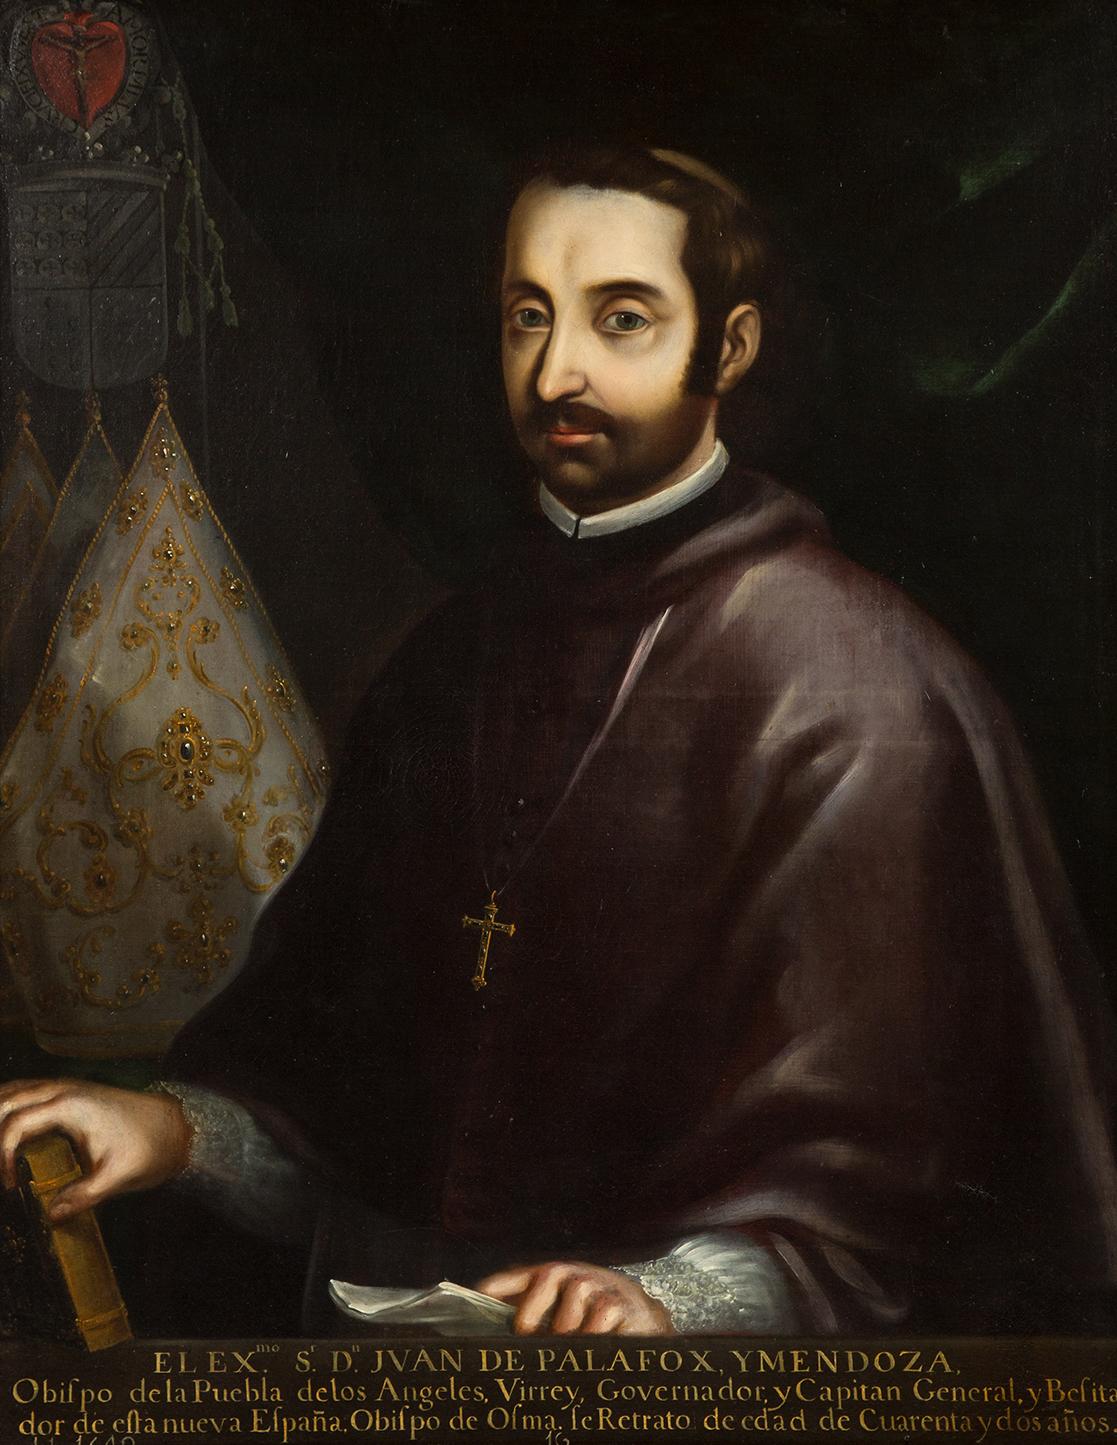 Blessed Juan de Palafox